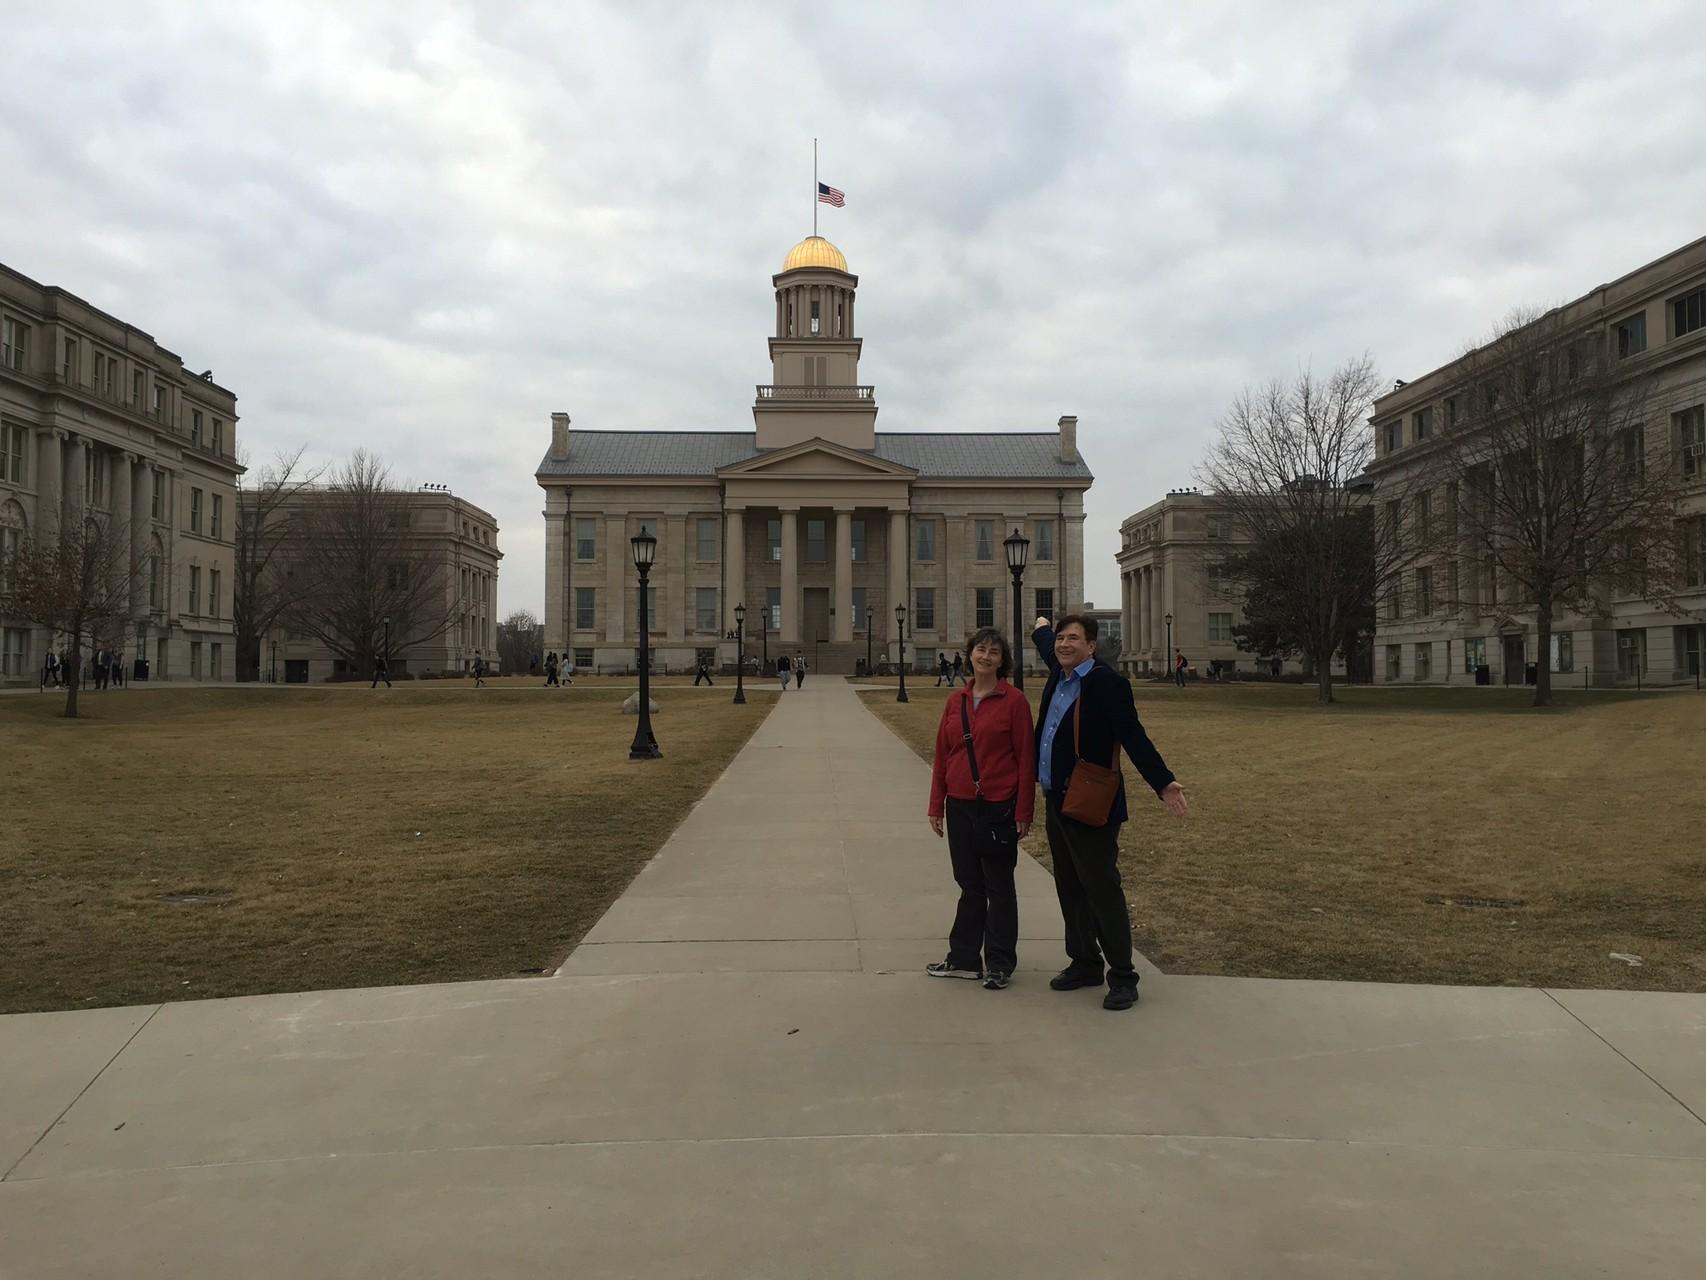 Ann & John at the old capital in Iowa City